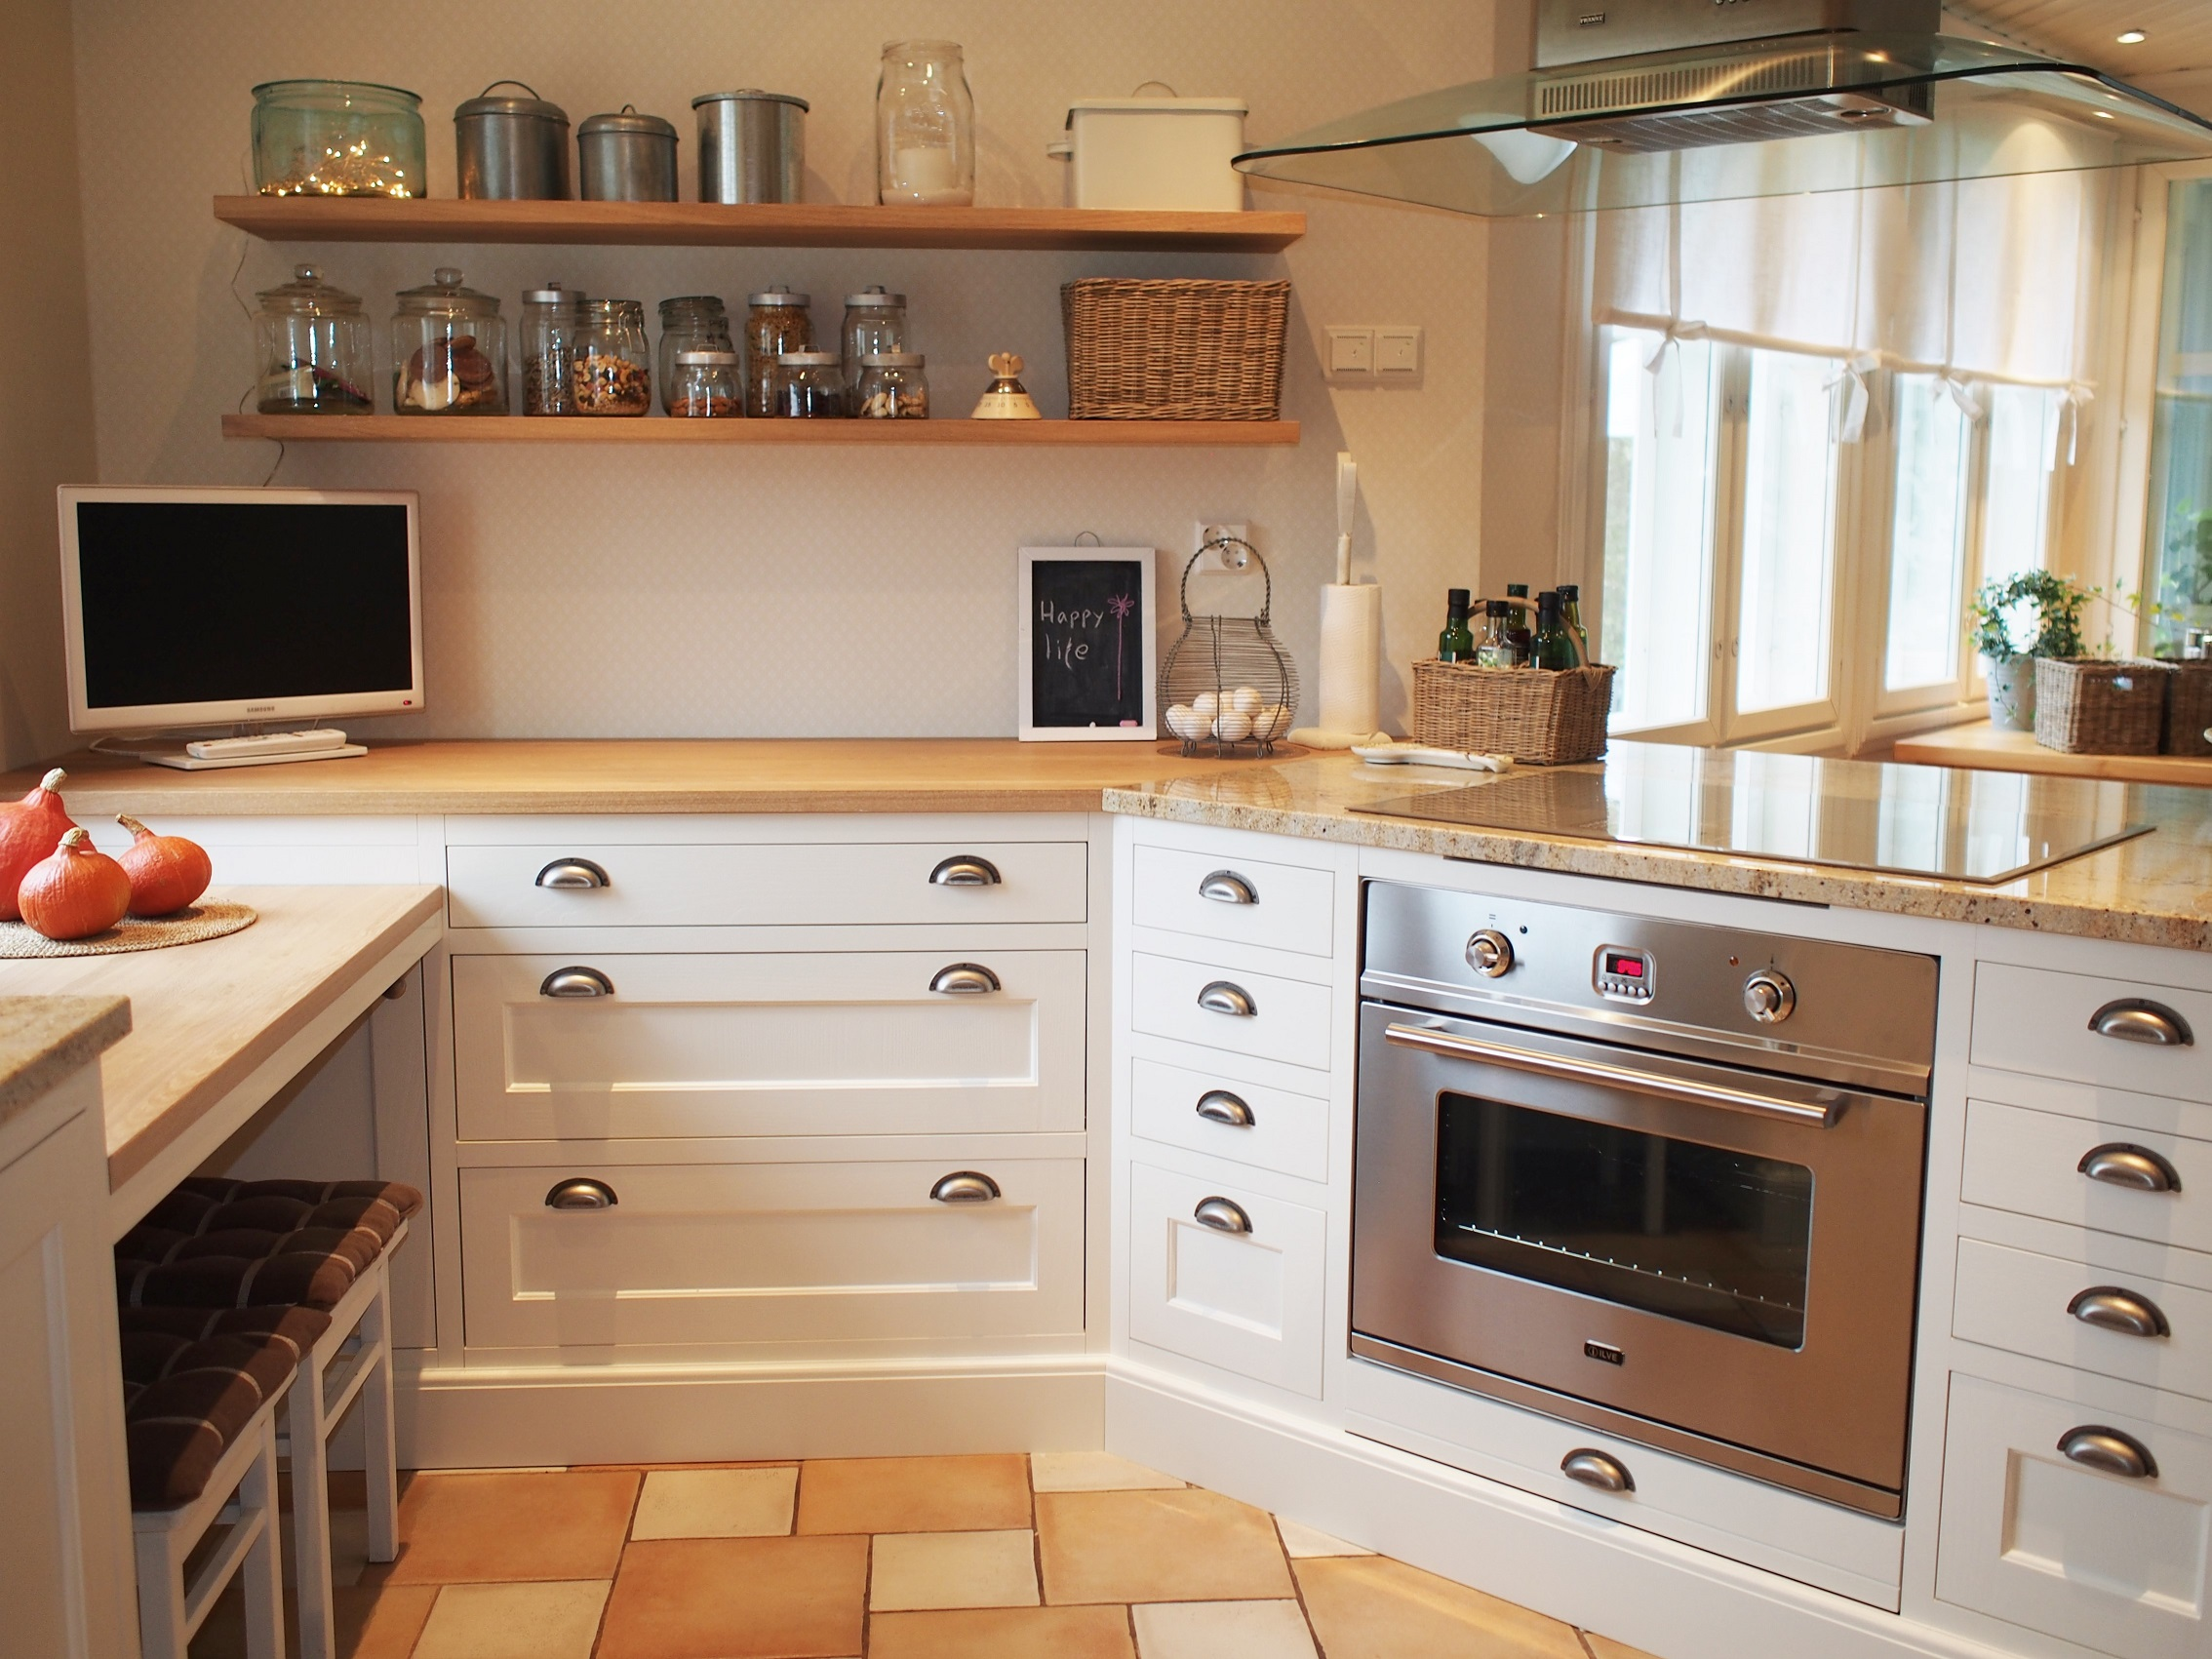 Vanhanajan keittiö 6 JALOKALUSTE.FI.jpg